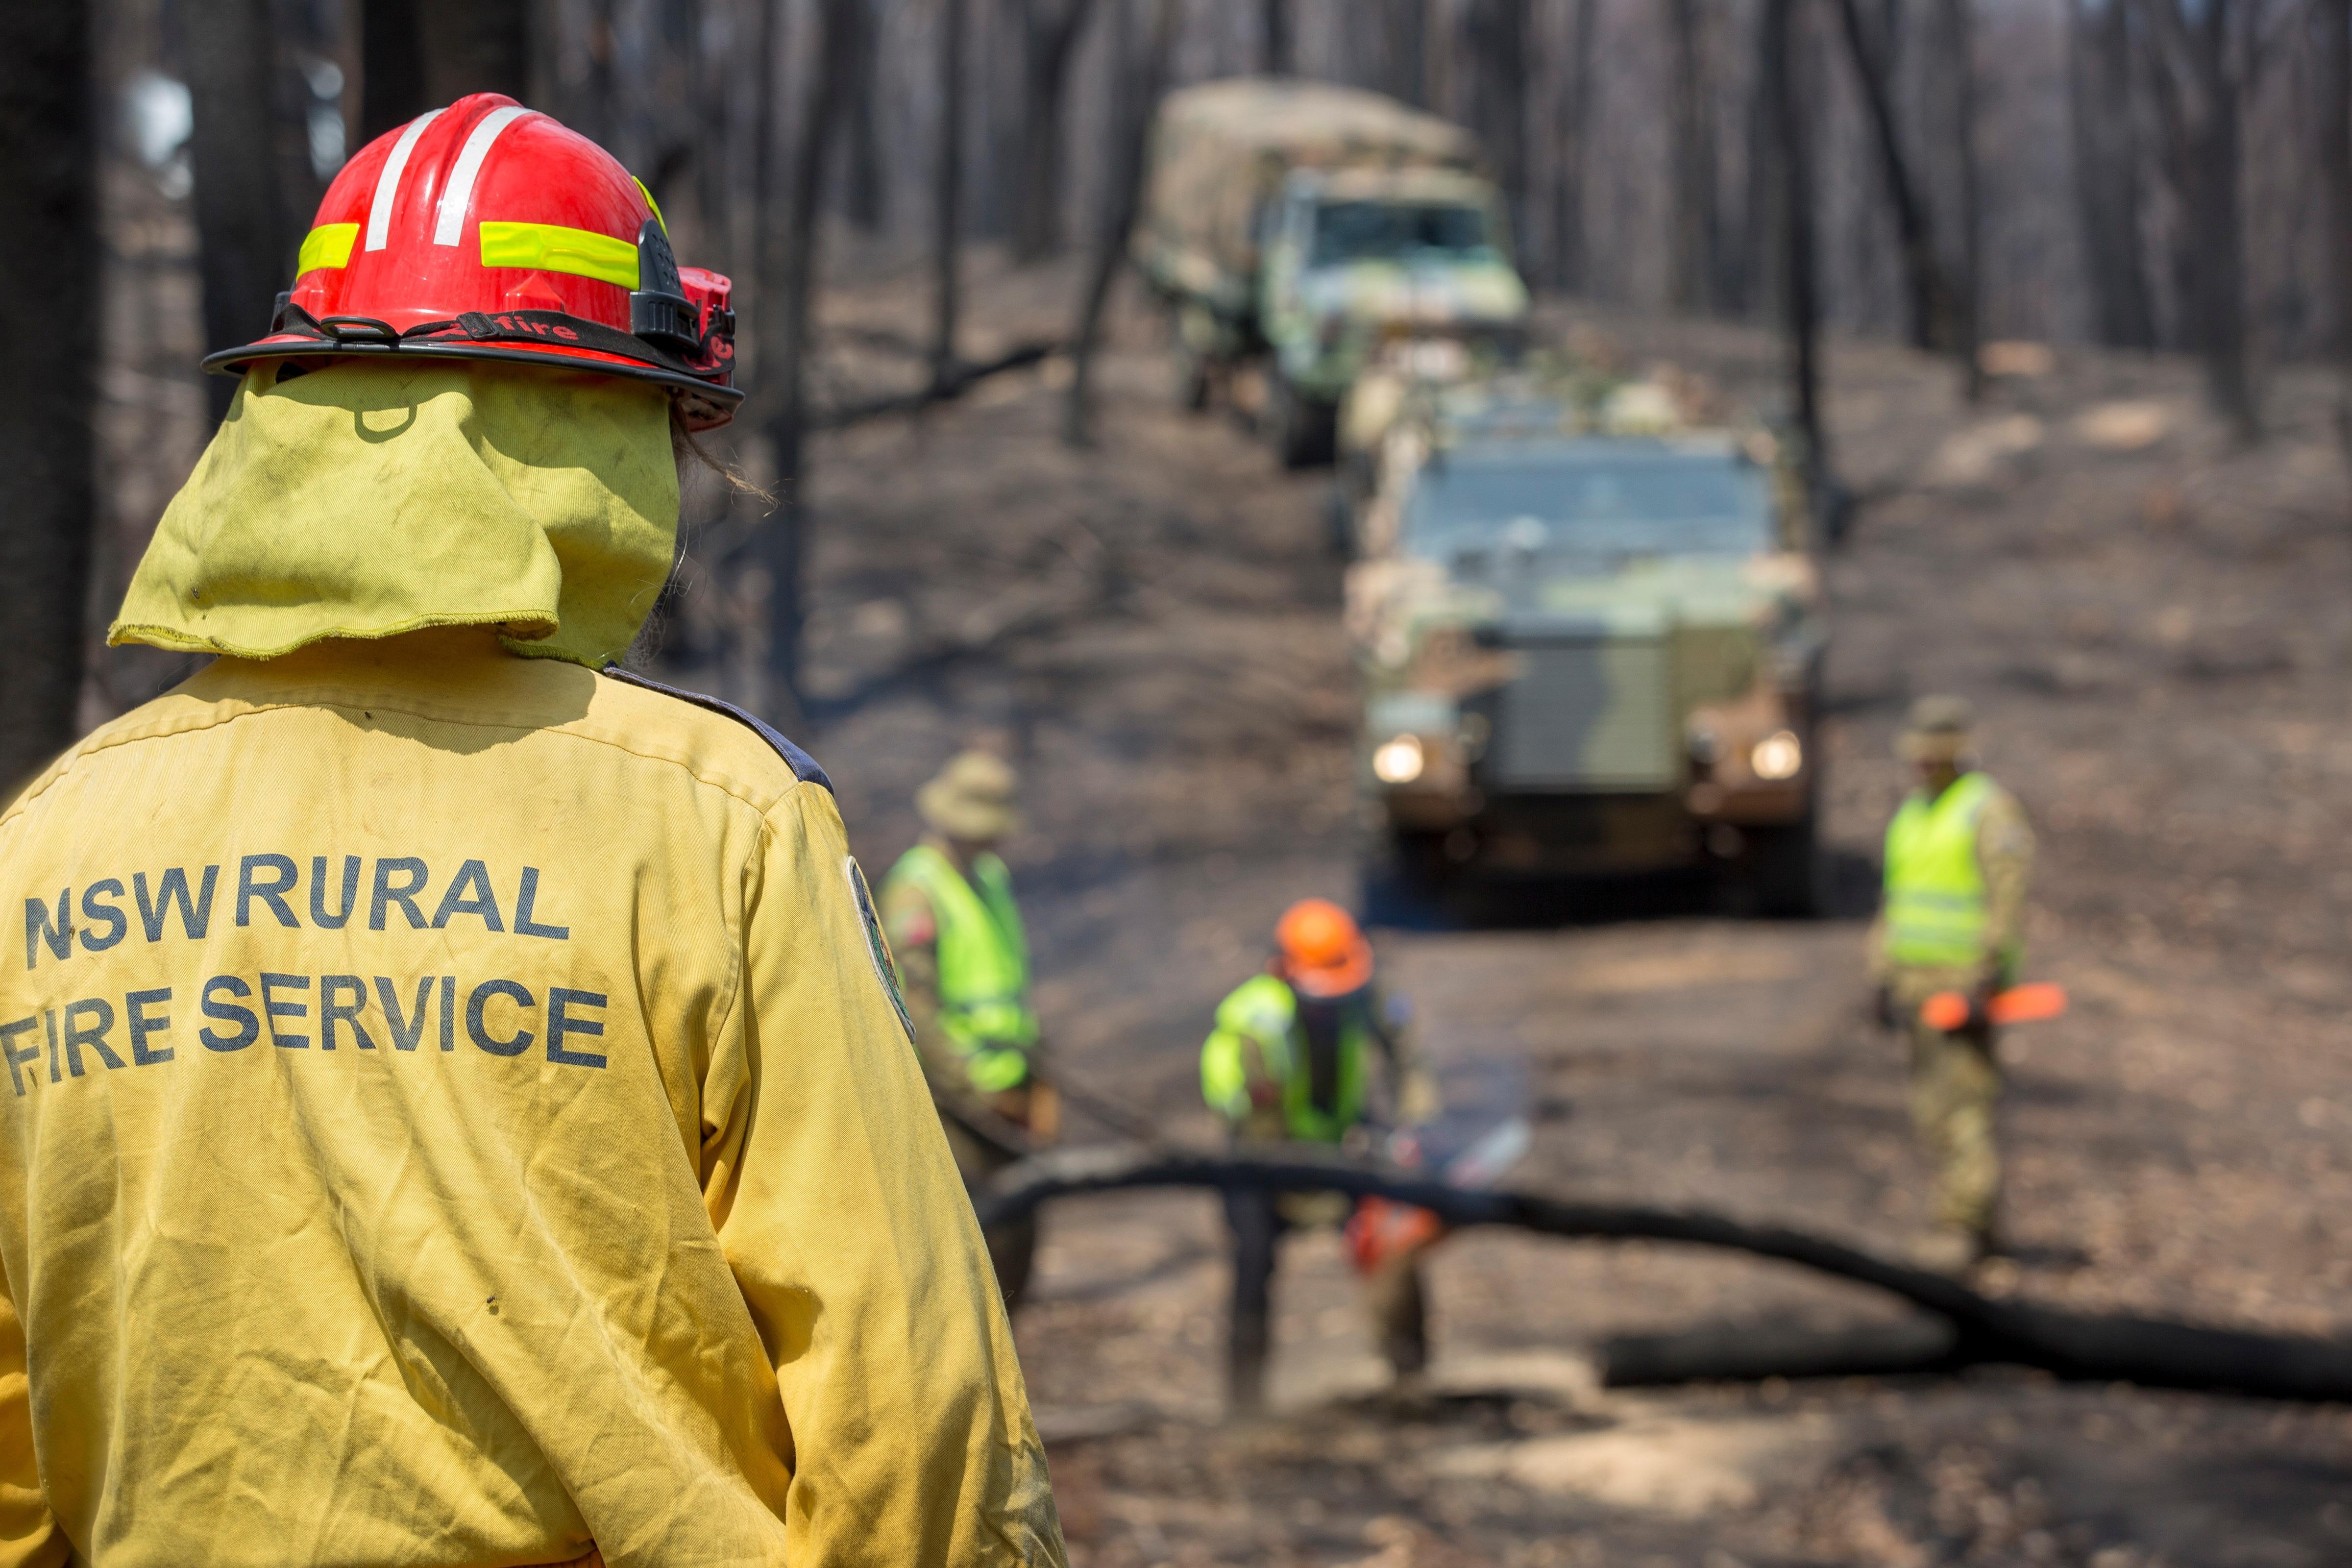 Rural Fire Service crews and Australian Army troops clear a fire break in regional NSW.